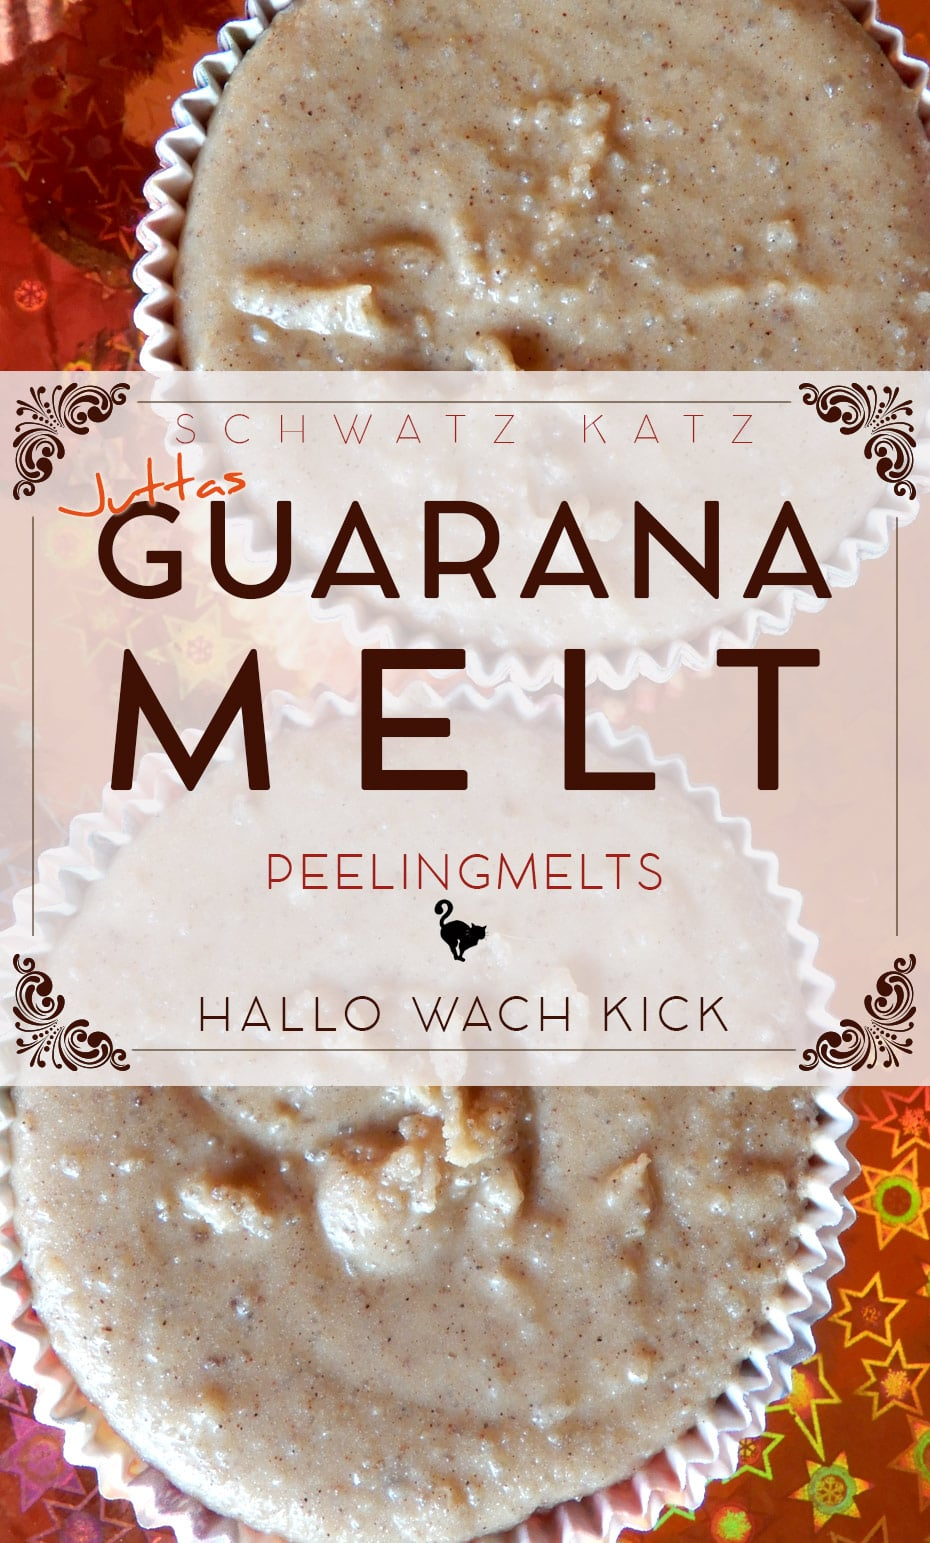 Guarana Bodypeeling Melt mit himmlischem Duft | Schwatz Katz